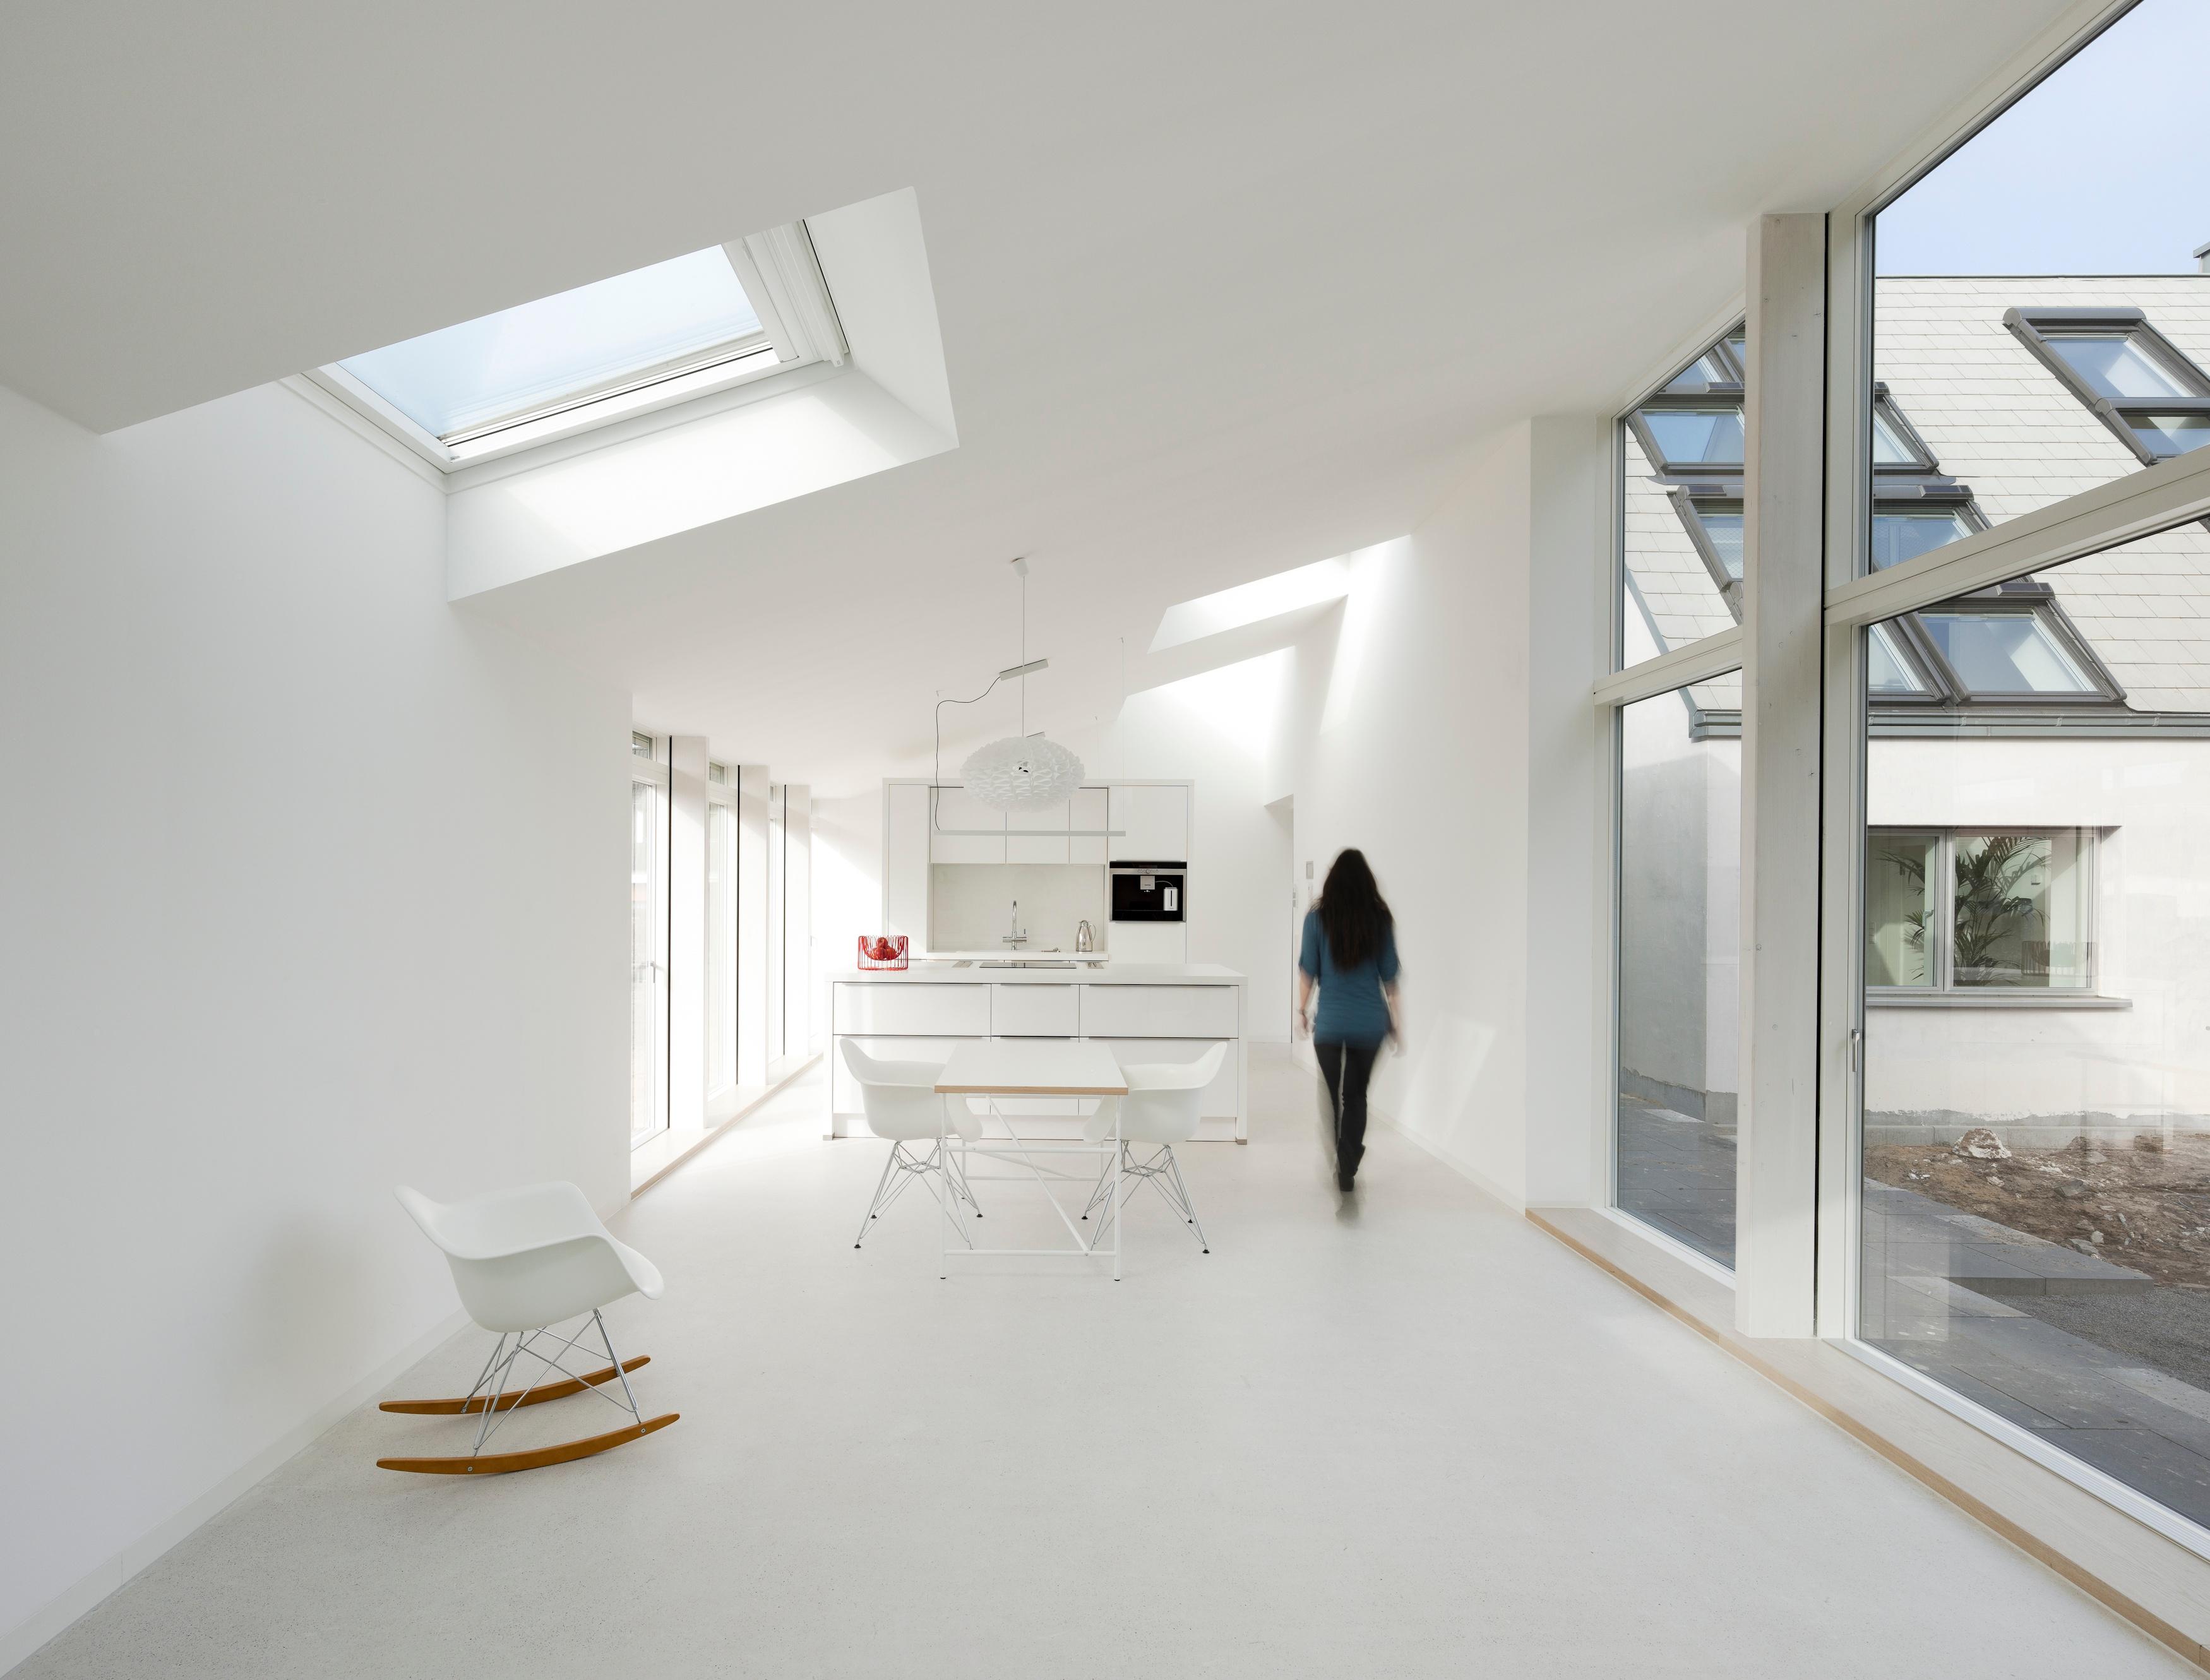 Hvid spisestue passer godt sammen med ovenlys-vinduer og store terrassedøre